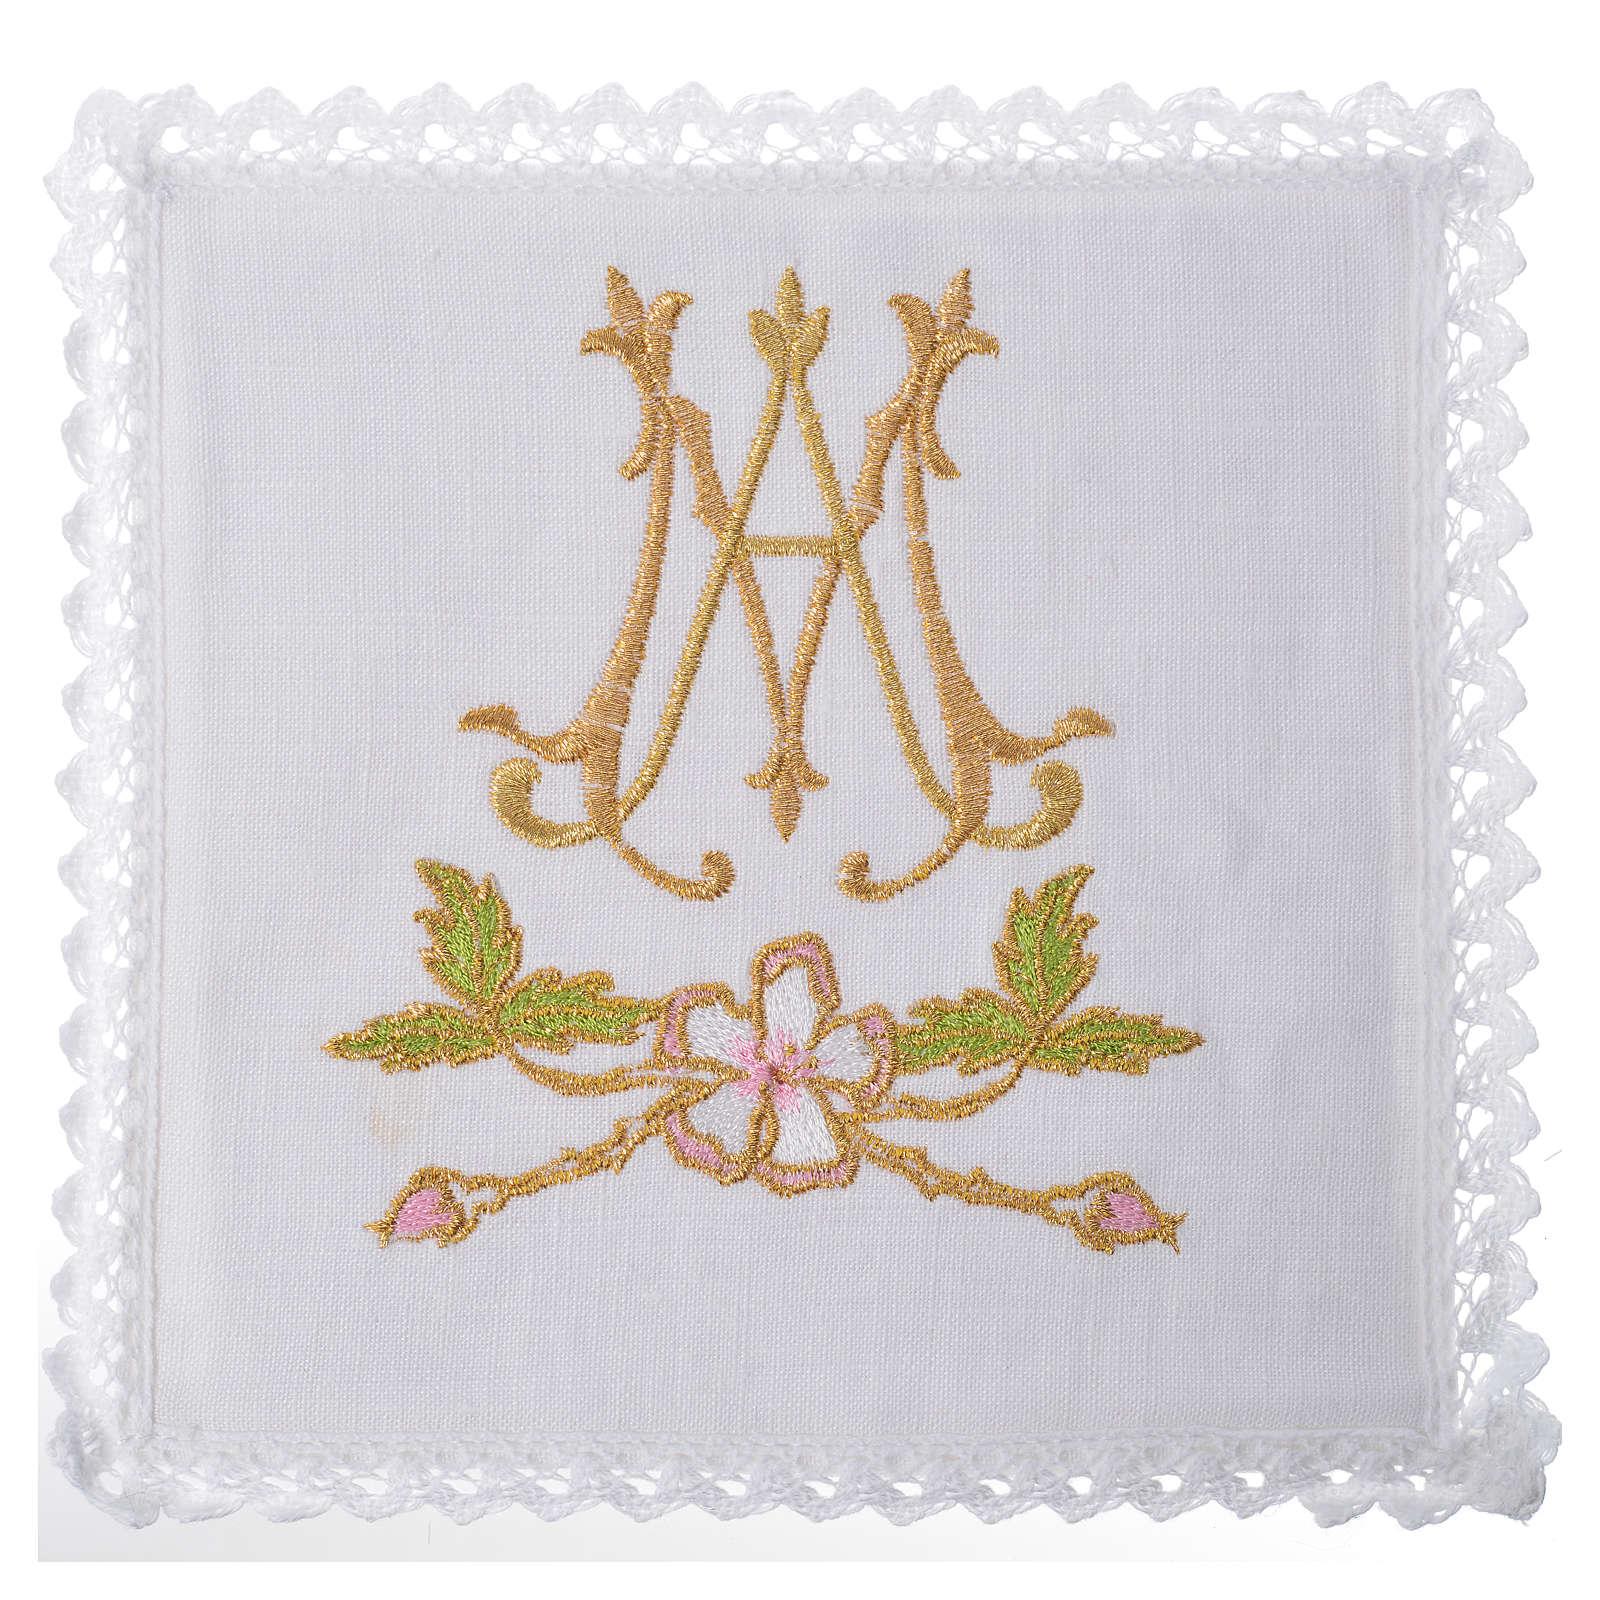 Altar linens set, 100% linen with Marian symbol 4